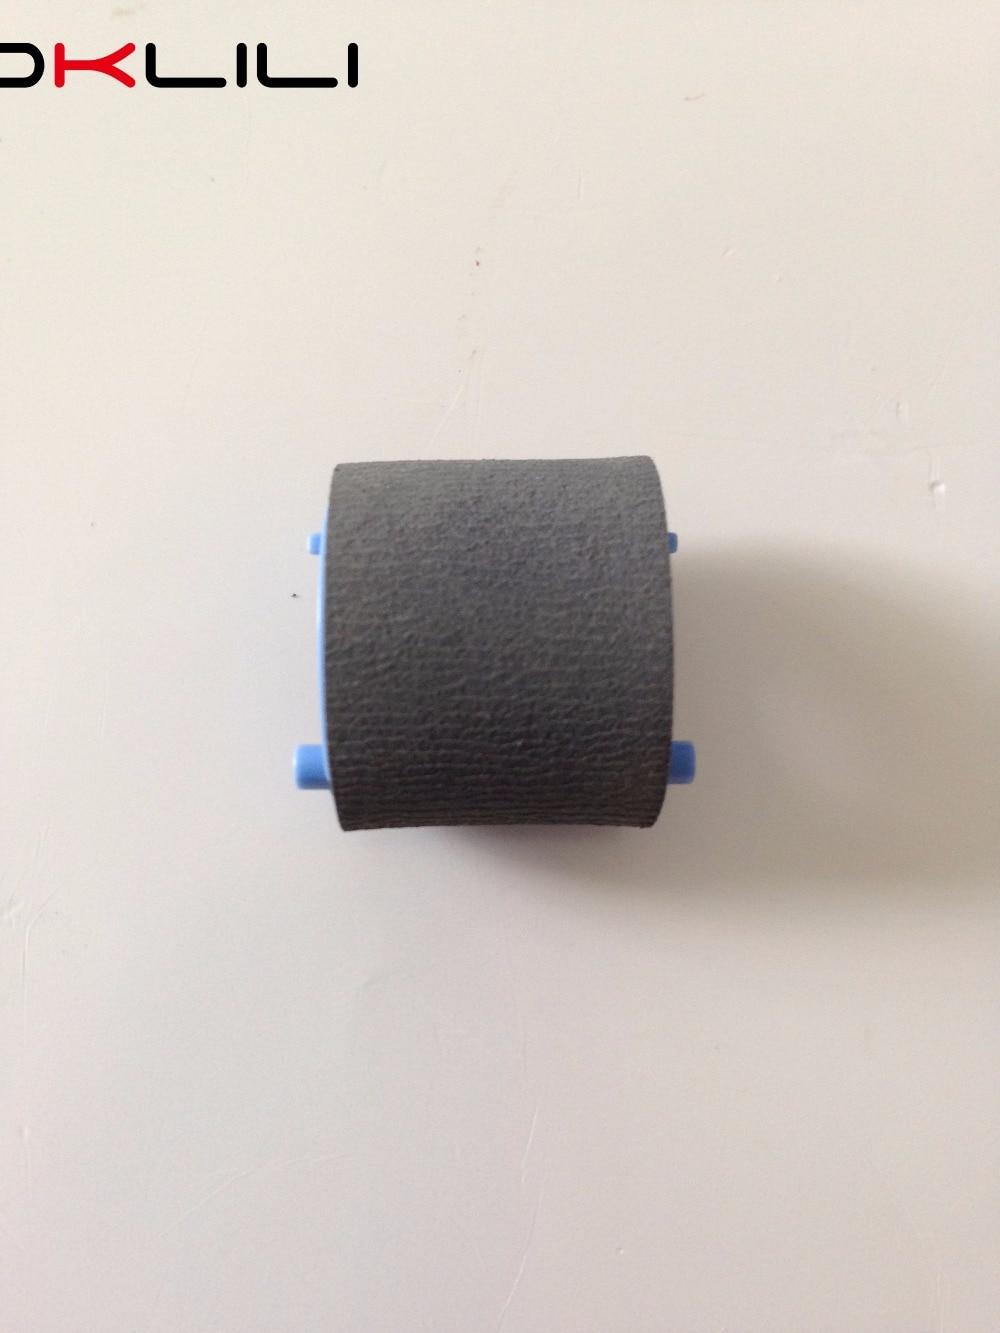 RL1-2593 RL1-2593-000 Paper Pickup Roller for HP P1102 M1212 M1214 M1217 M1132 M1212nf M1214nfh M1217nfw P1102w Canon MF3010